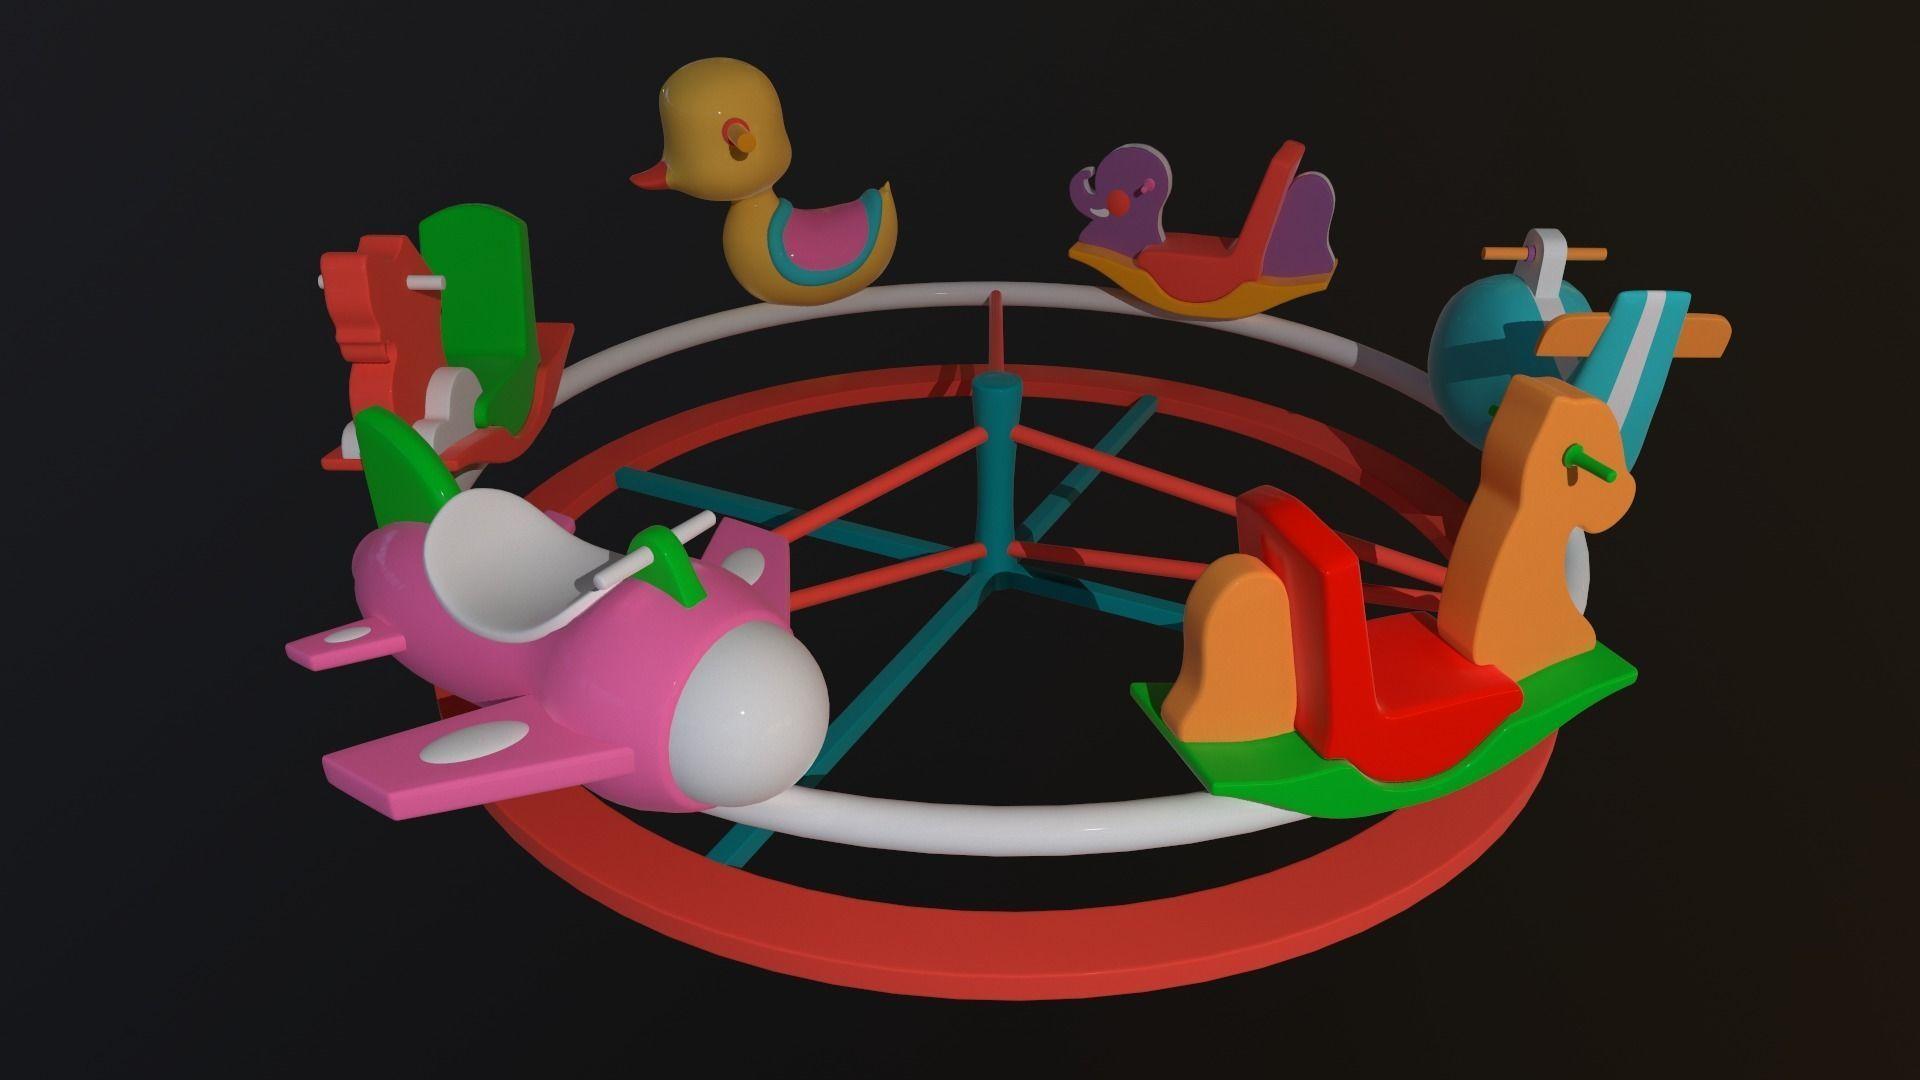 Asset - Cartoons - Toys -Ferris wheel - 3D Model - Rig